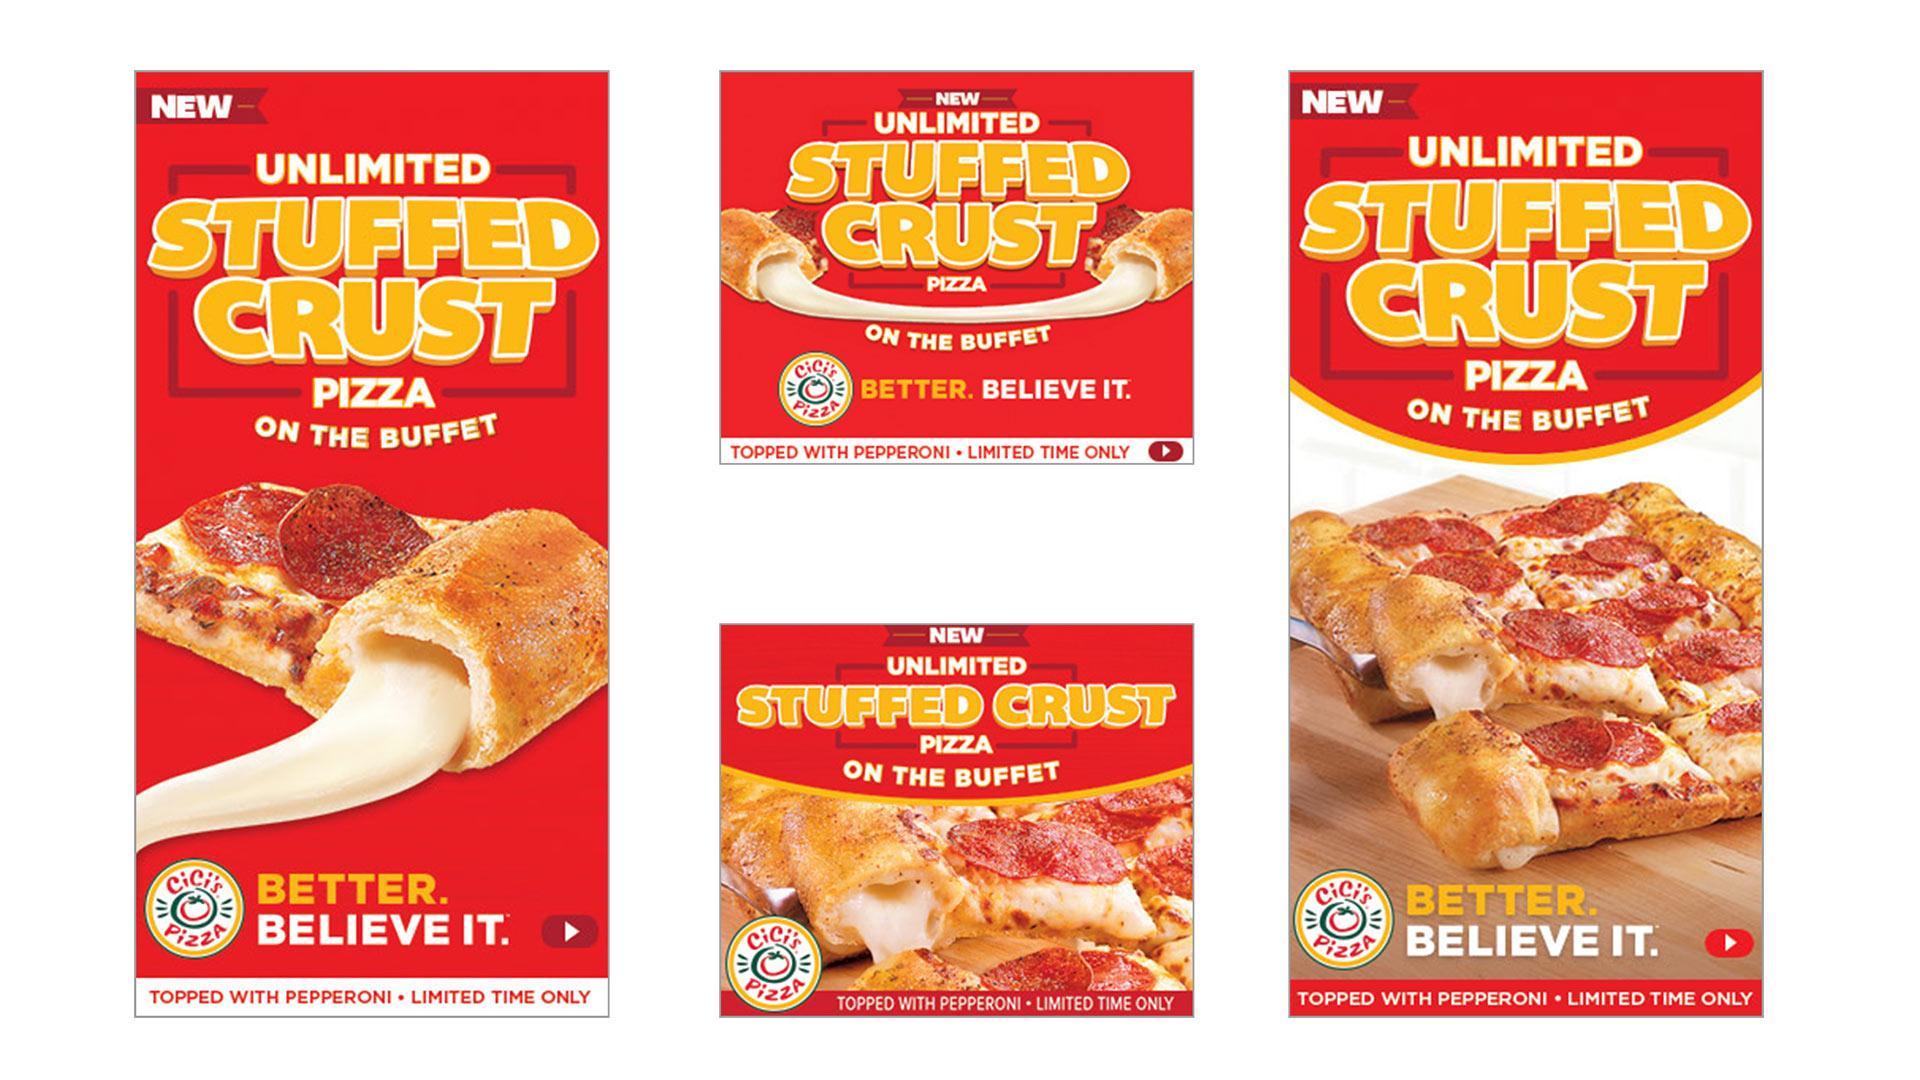 cicis-stuffed-crust-web-banners